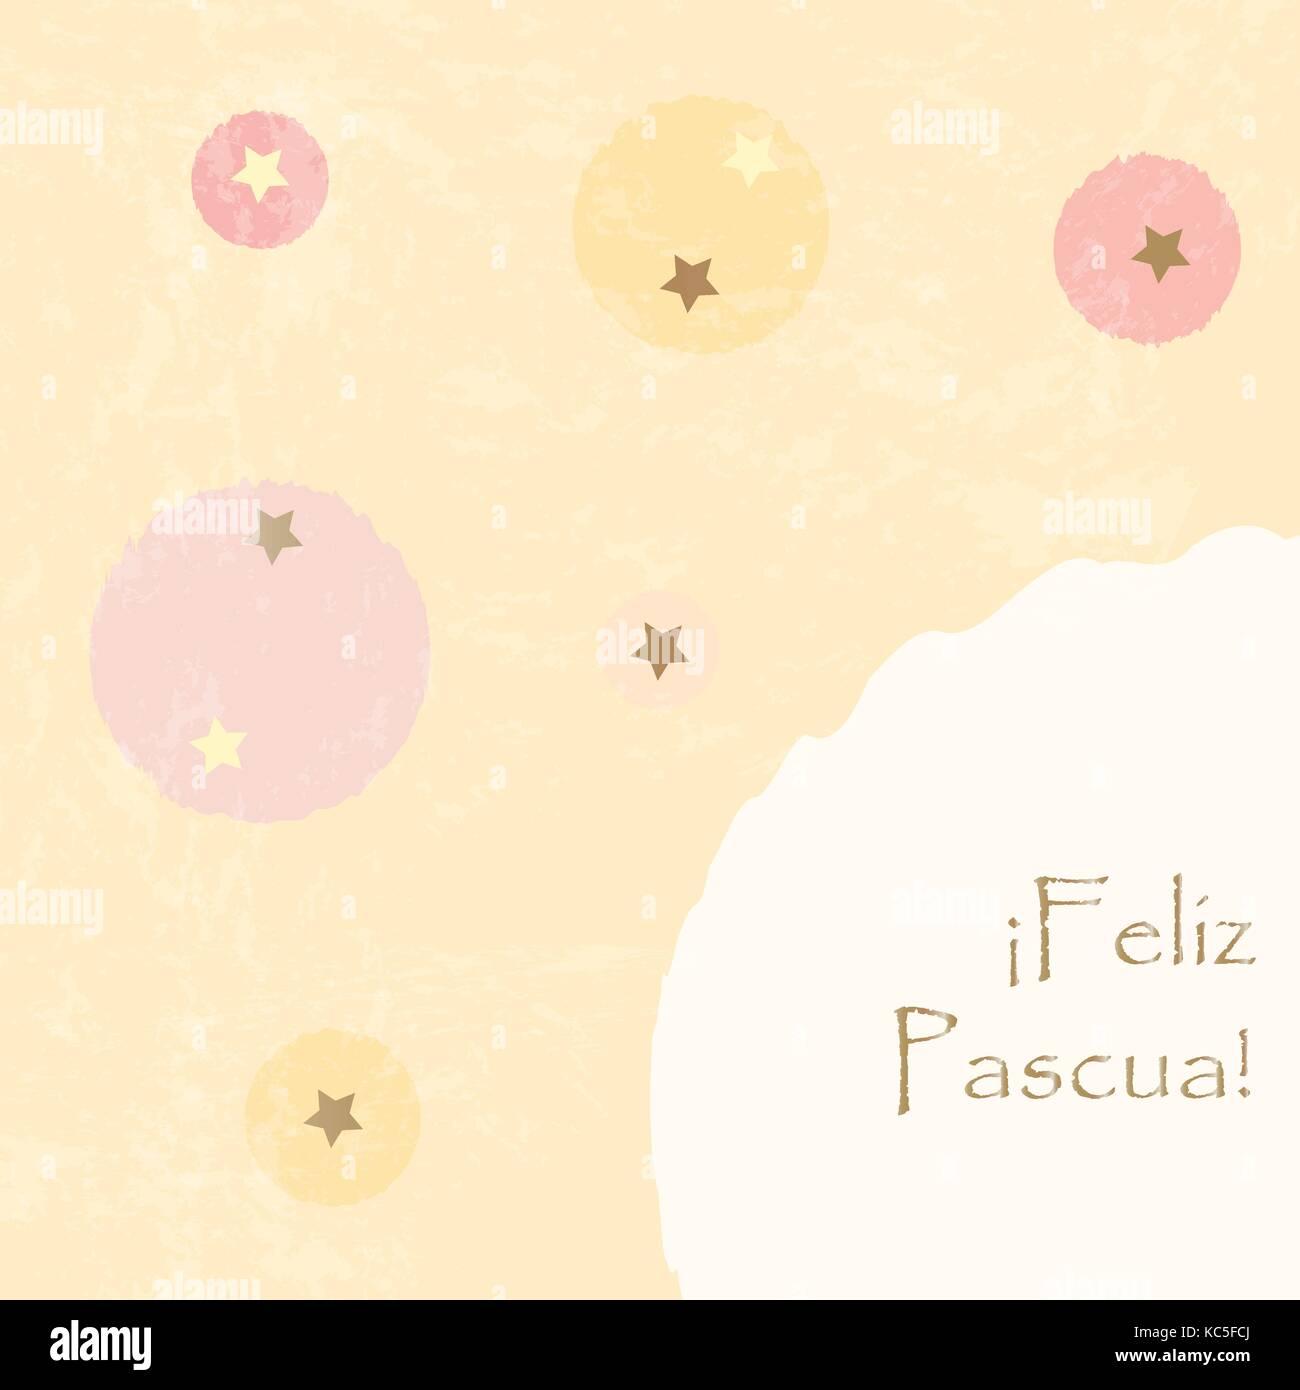 Happy easter greeting card spanish language vector illustration happy easter greeting card spanish language vector illustration m4hsunfo